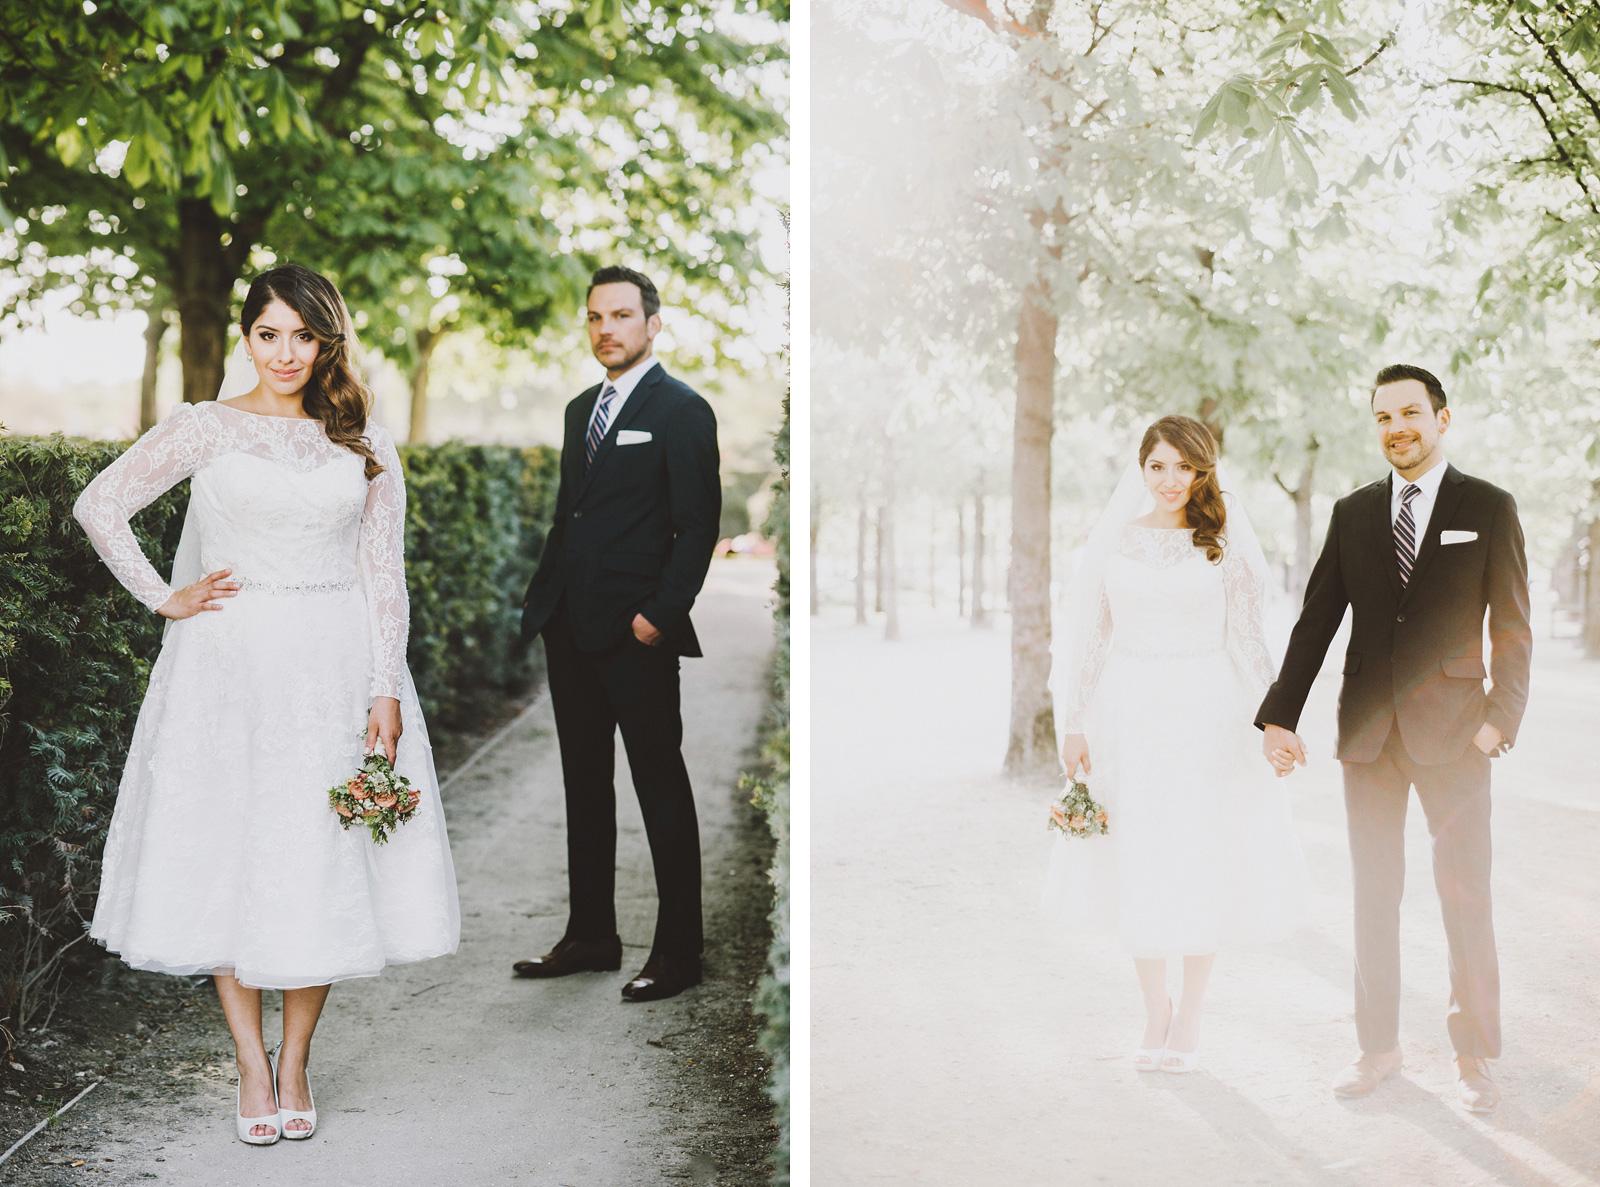 springtime-paris-elopement-kimsmithmiller-067